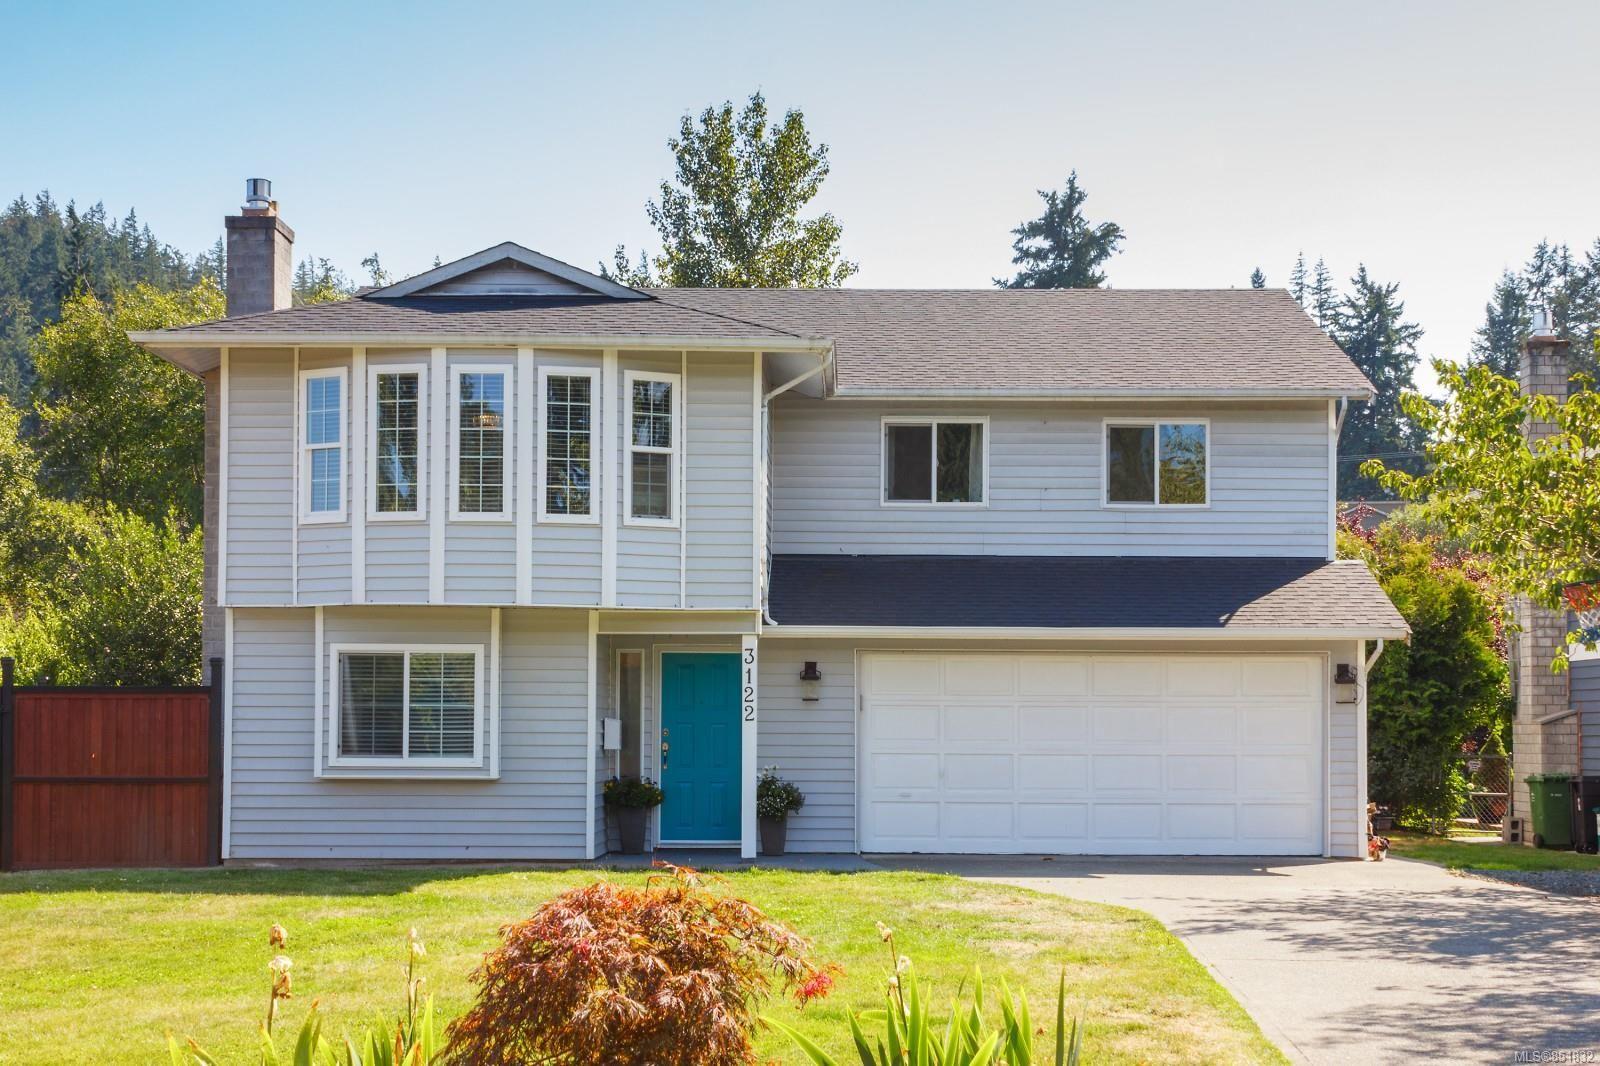 Main Photo: 3122 Flannagan Pl in : Co Sun Ridge House for sale (Colwood)  : MLS®# 851832